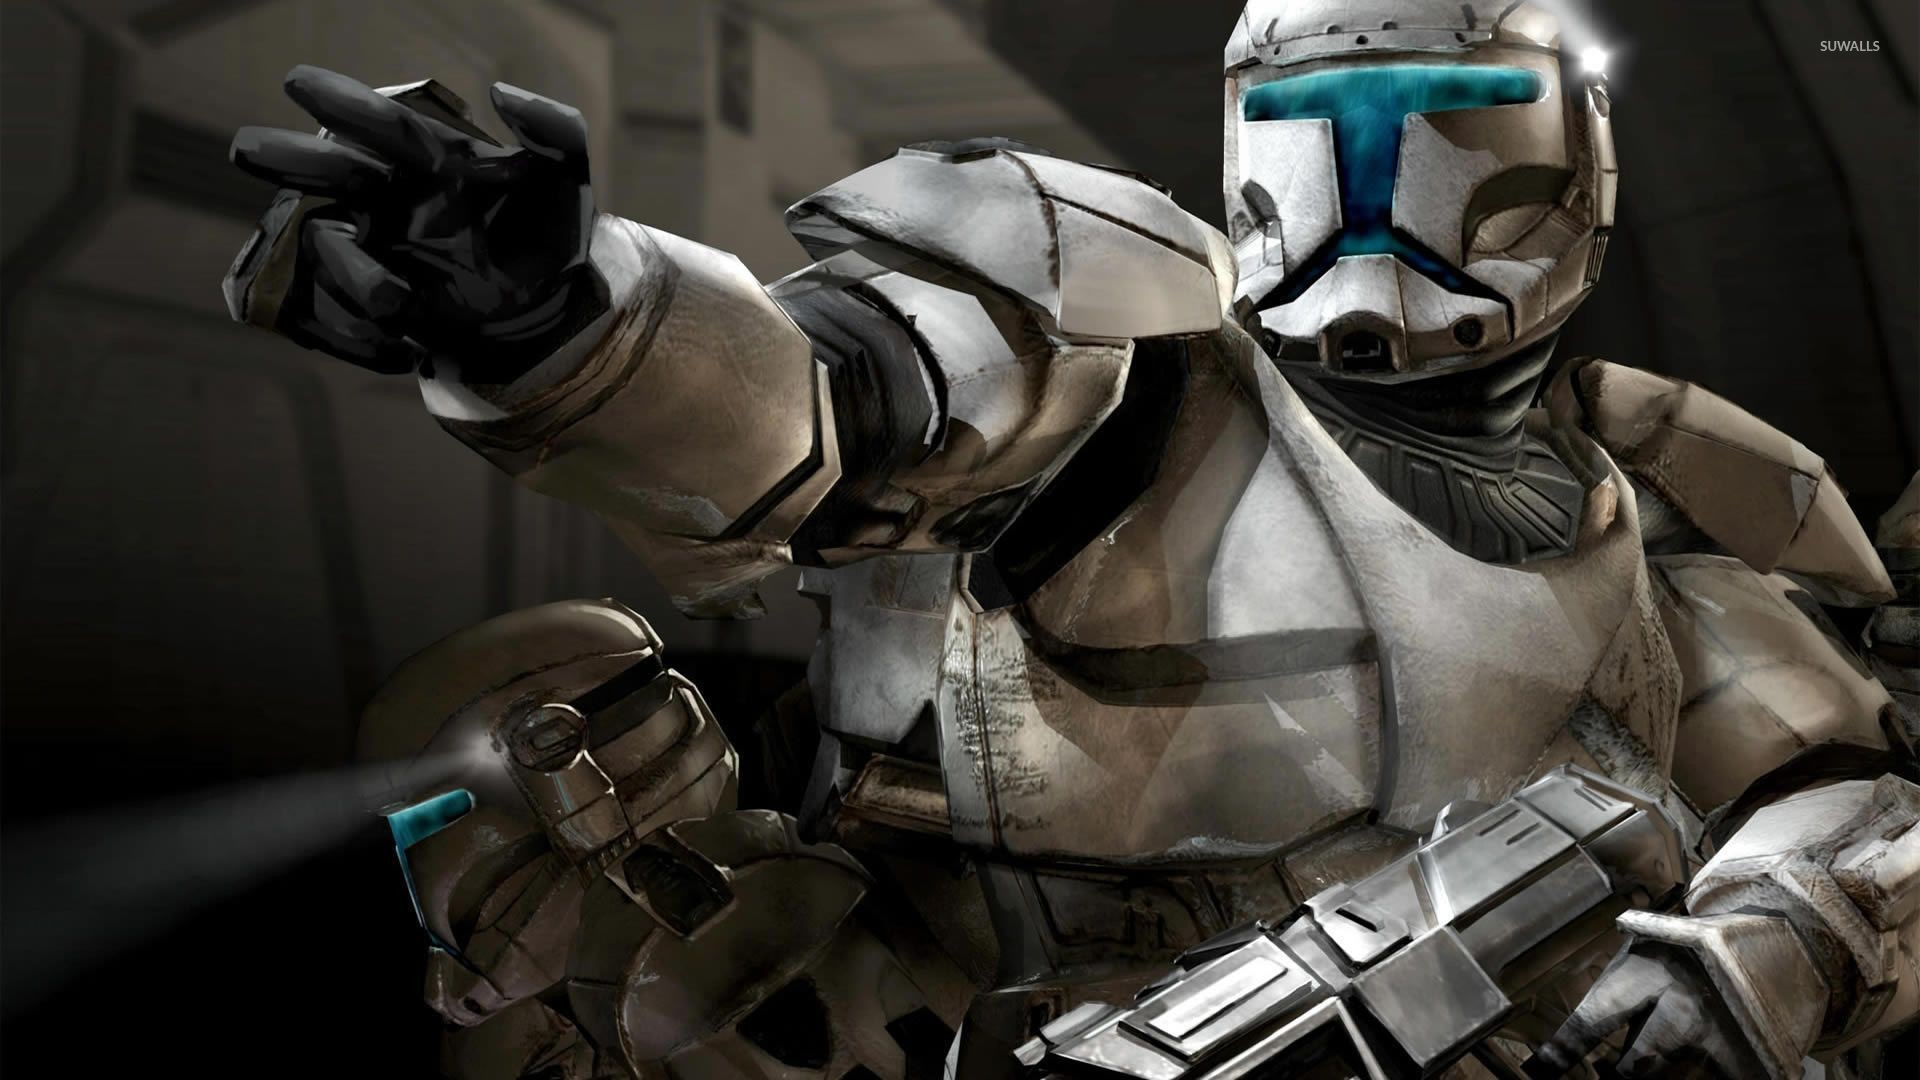 Star Wars – Republic Commando [2] wallpaper jpg